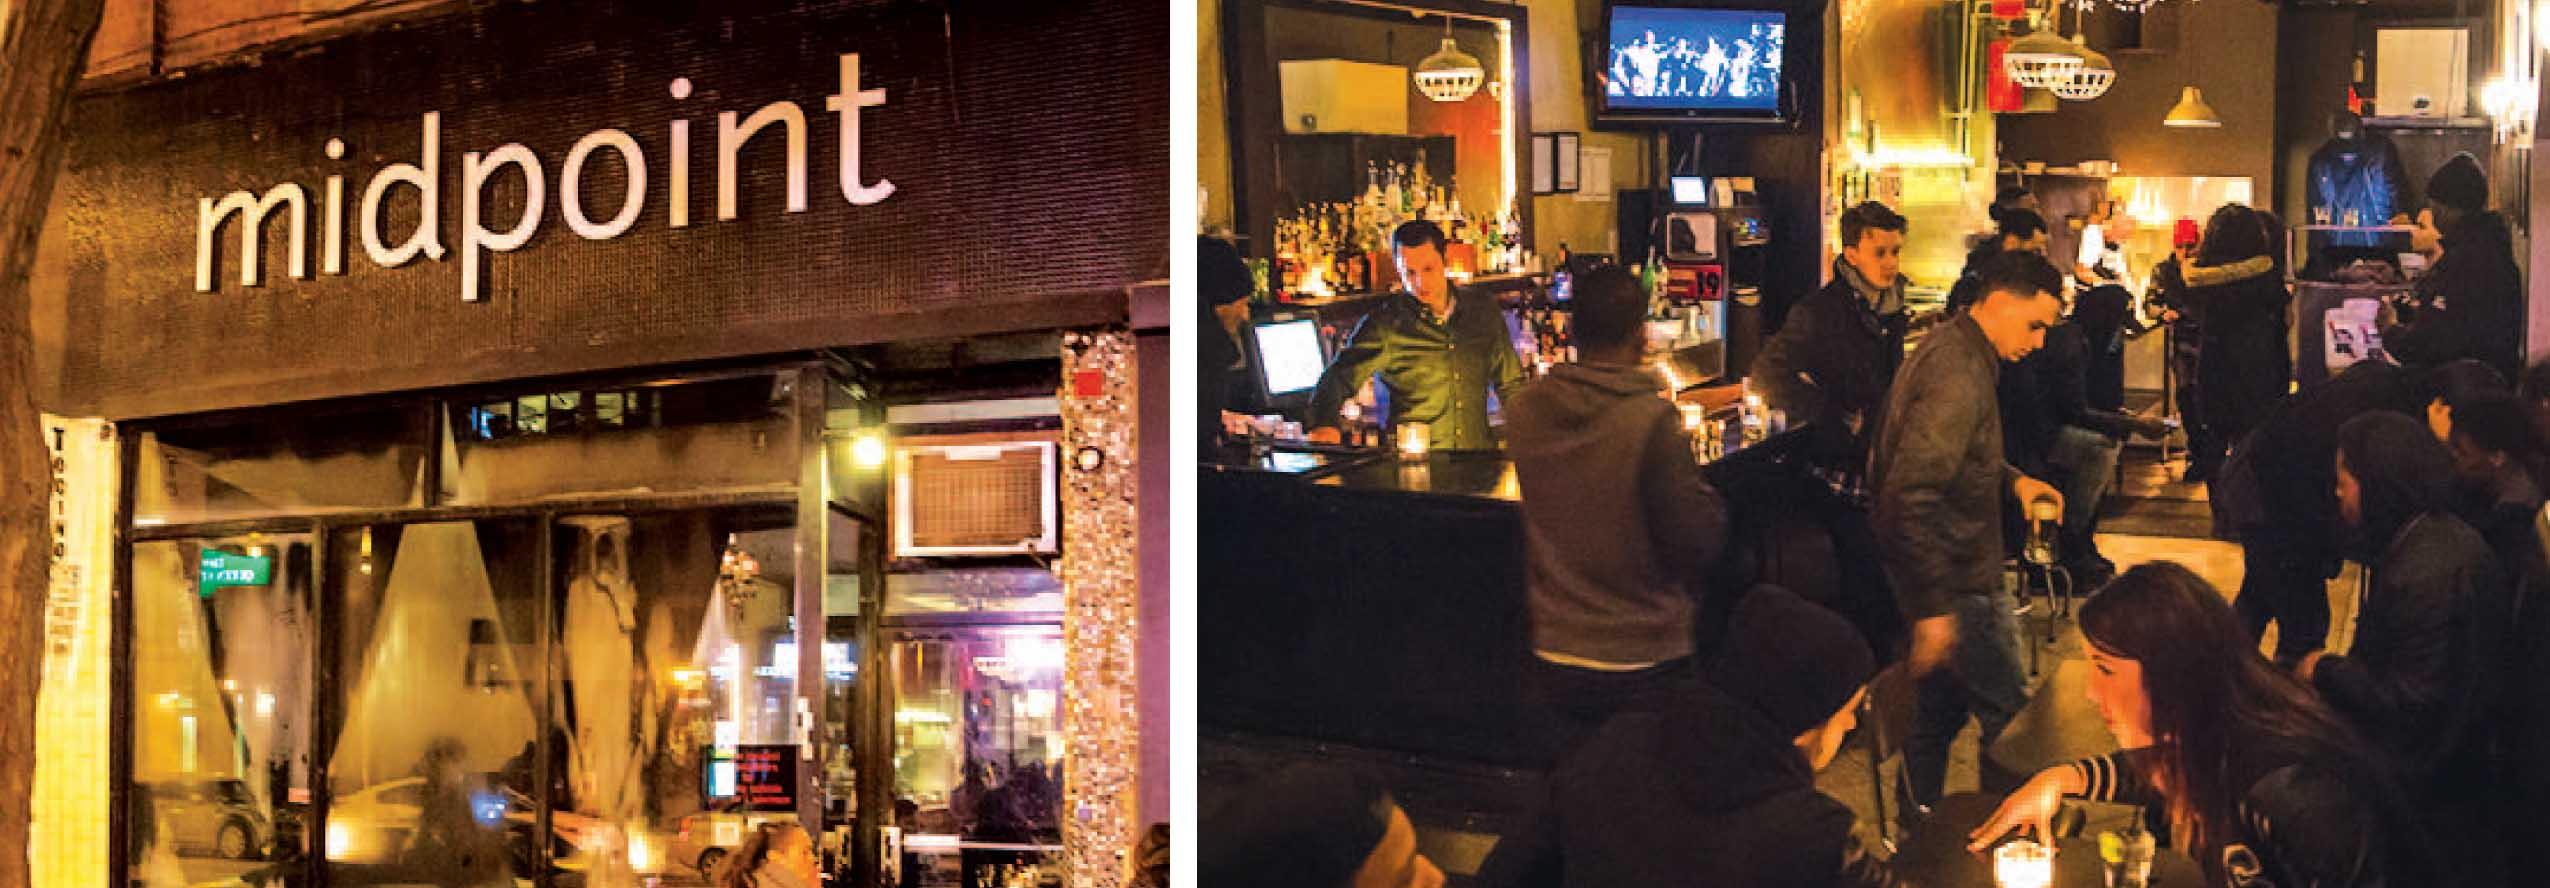 Midpoint Restaurant & Bar